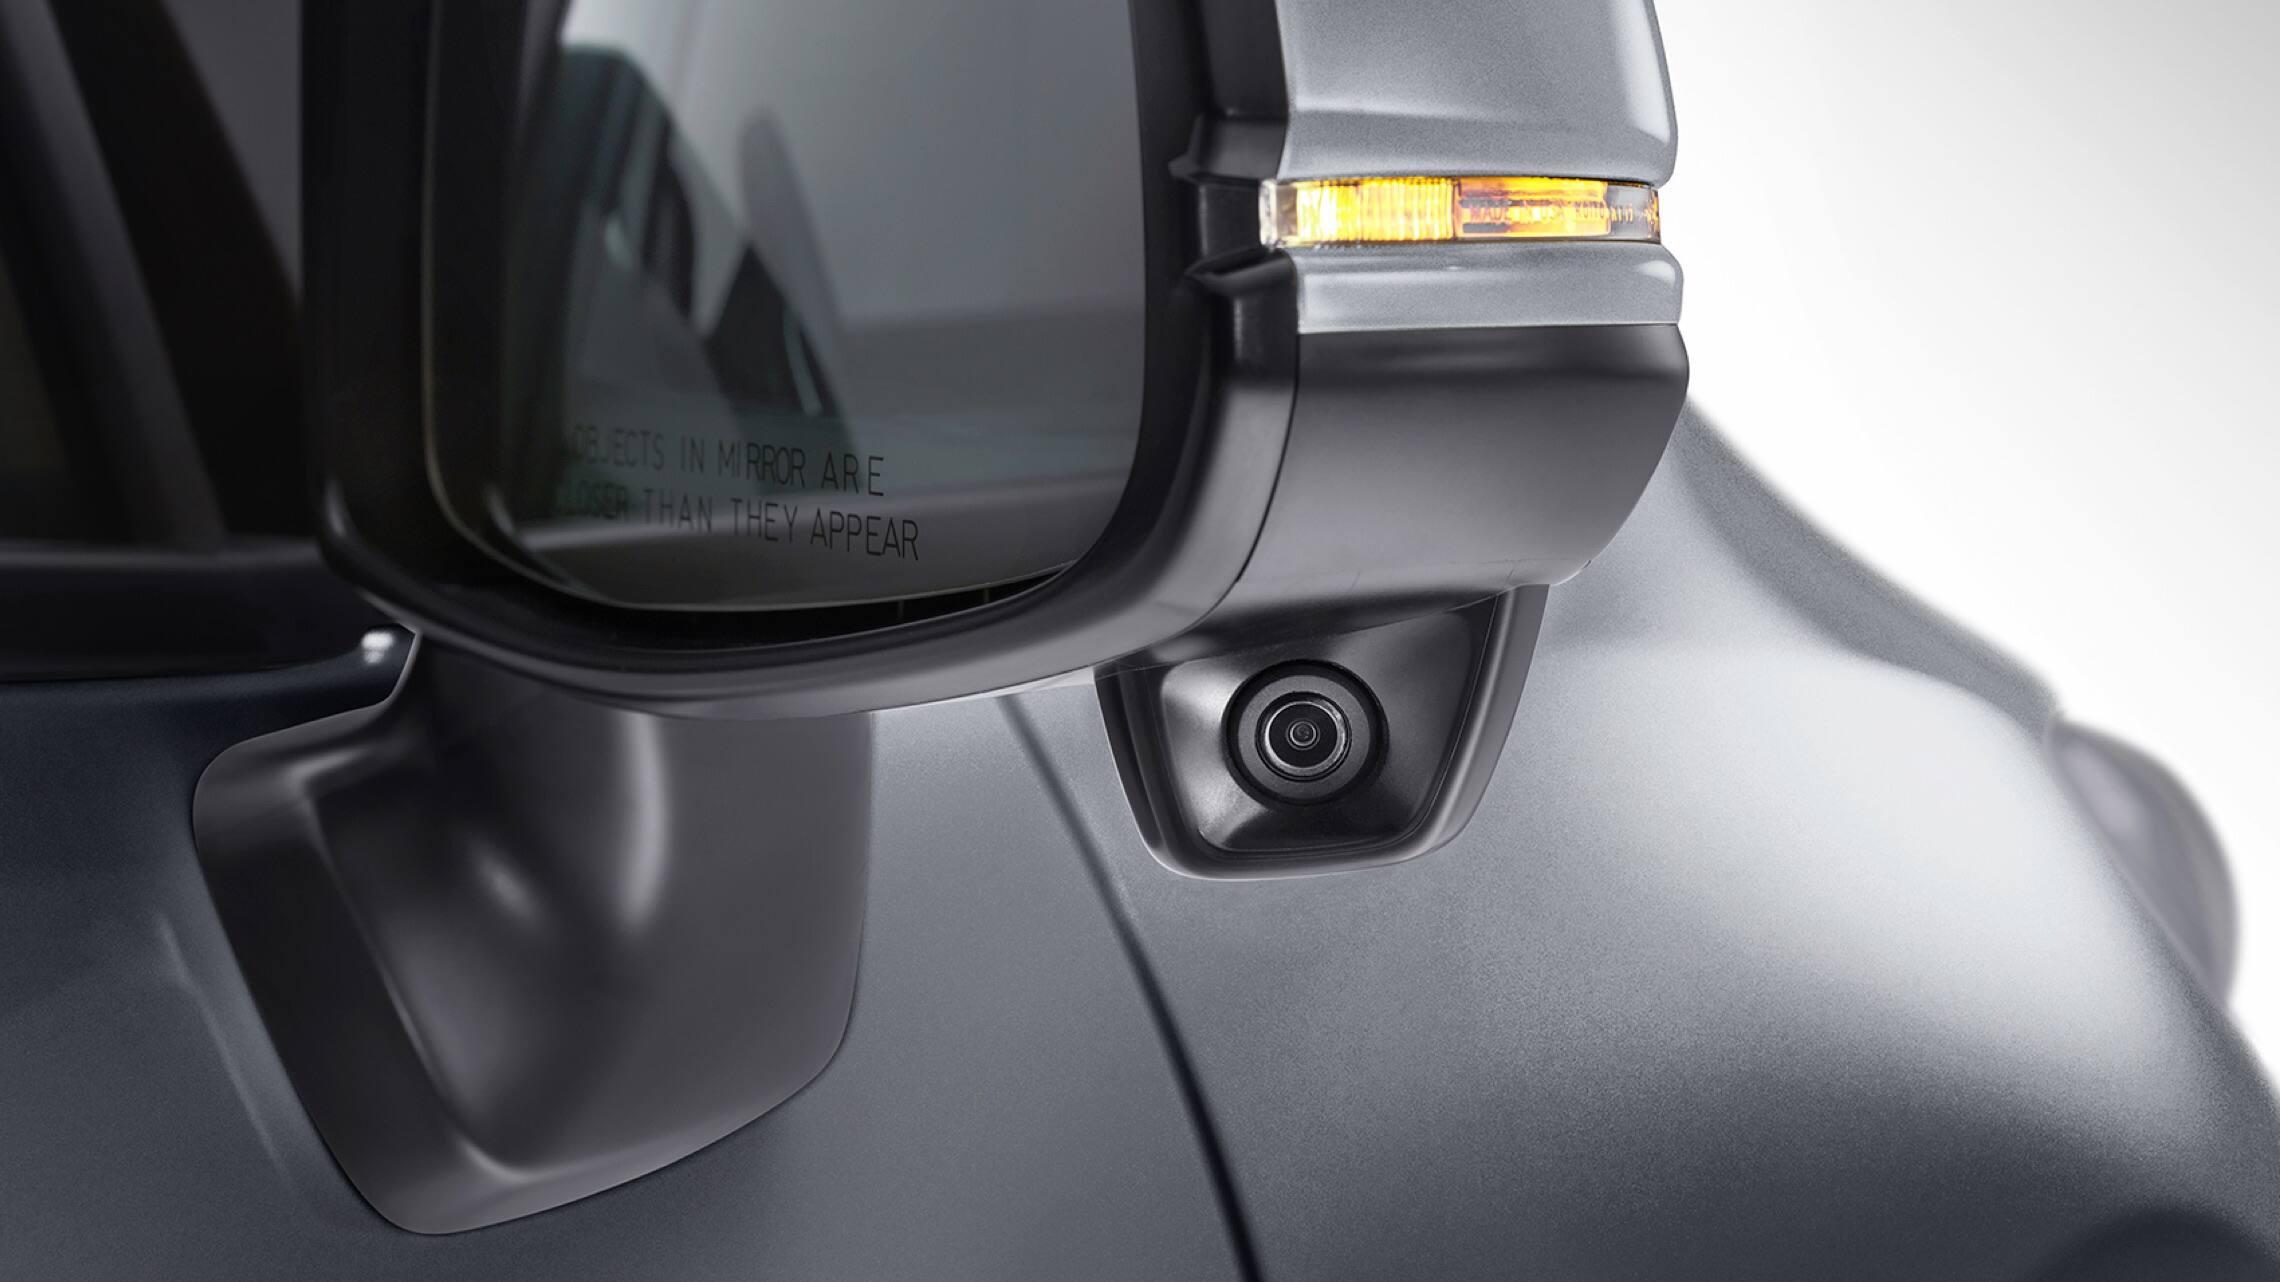 Vista en primer plano exterior de la característica Honda LaneWatch™ en el espejo del lado del pasajero en el Honda Fit EX-L2020.